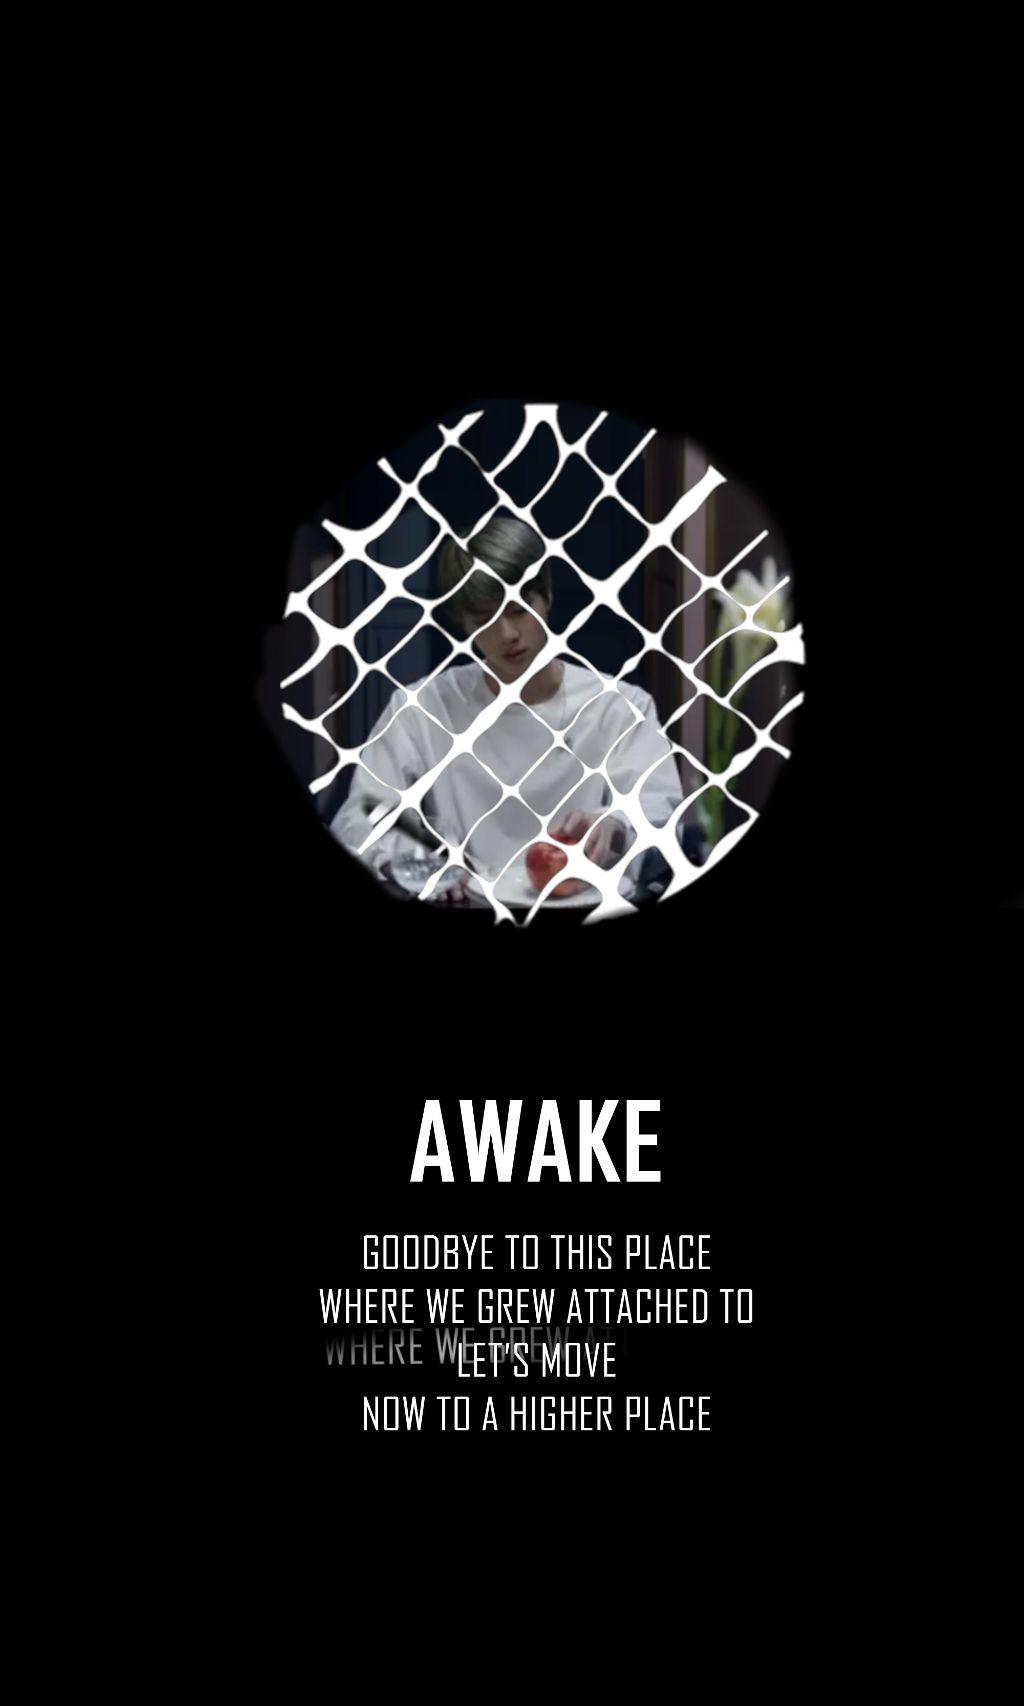 Jin Awake I Ll Do Loveyourself Wallpapers Next Bts